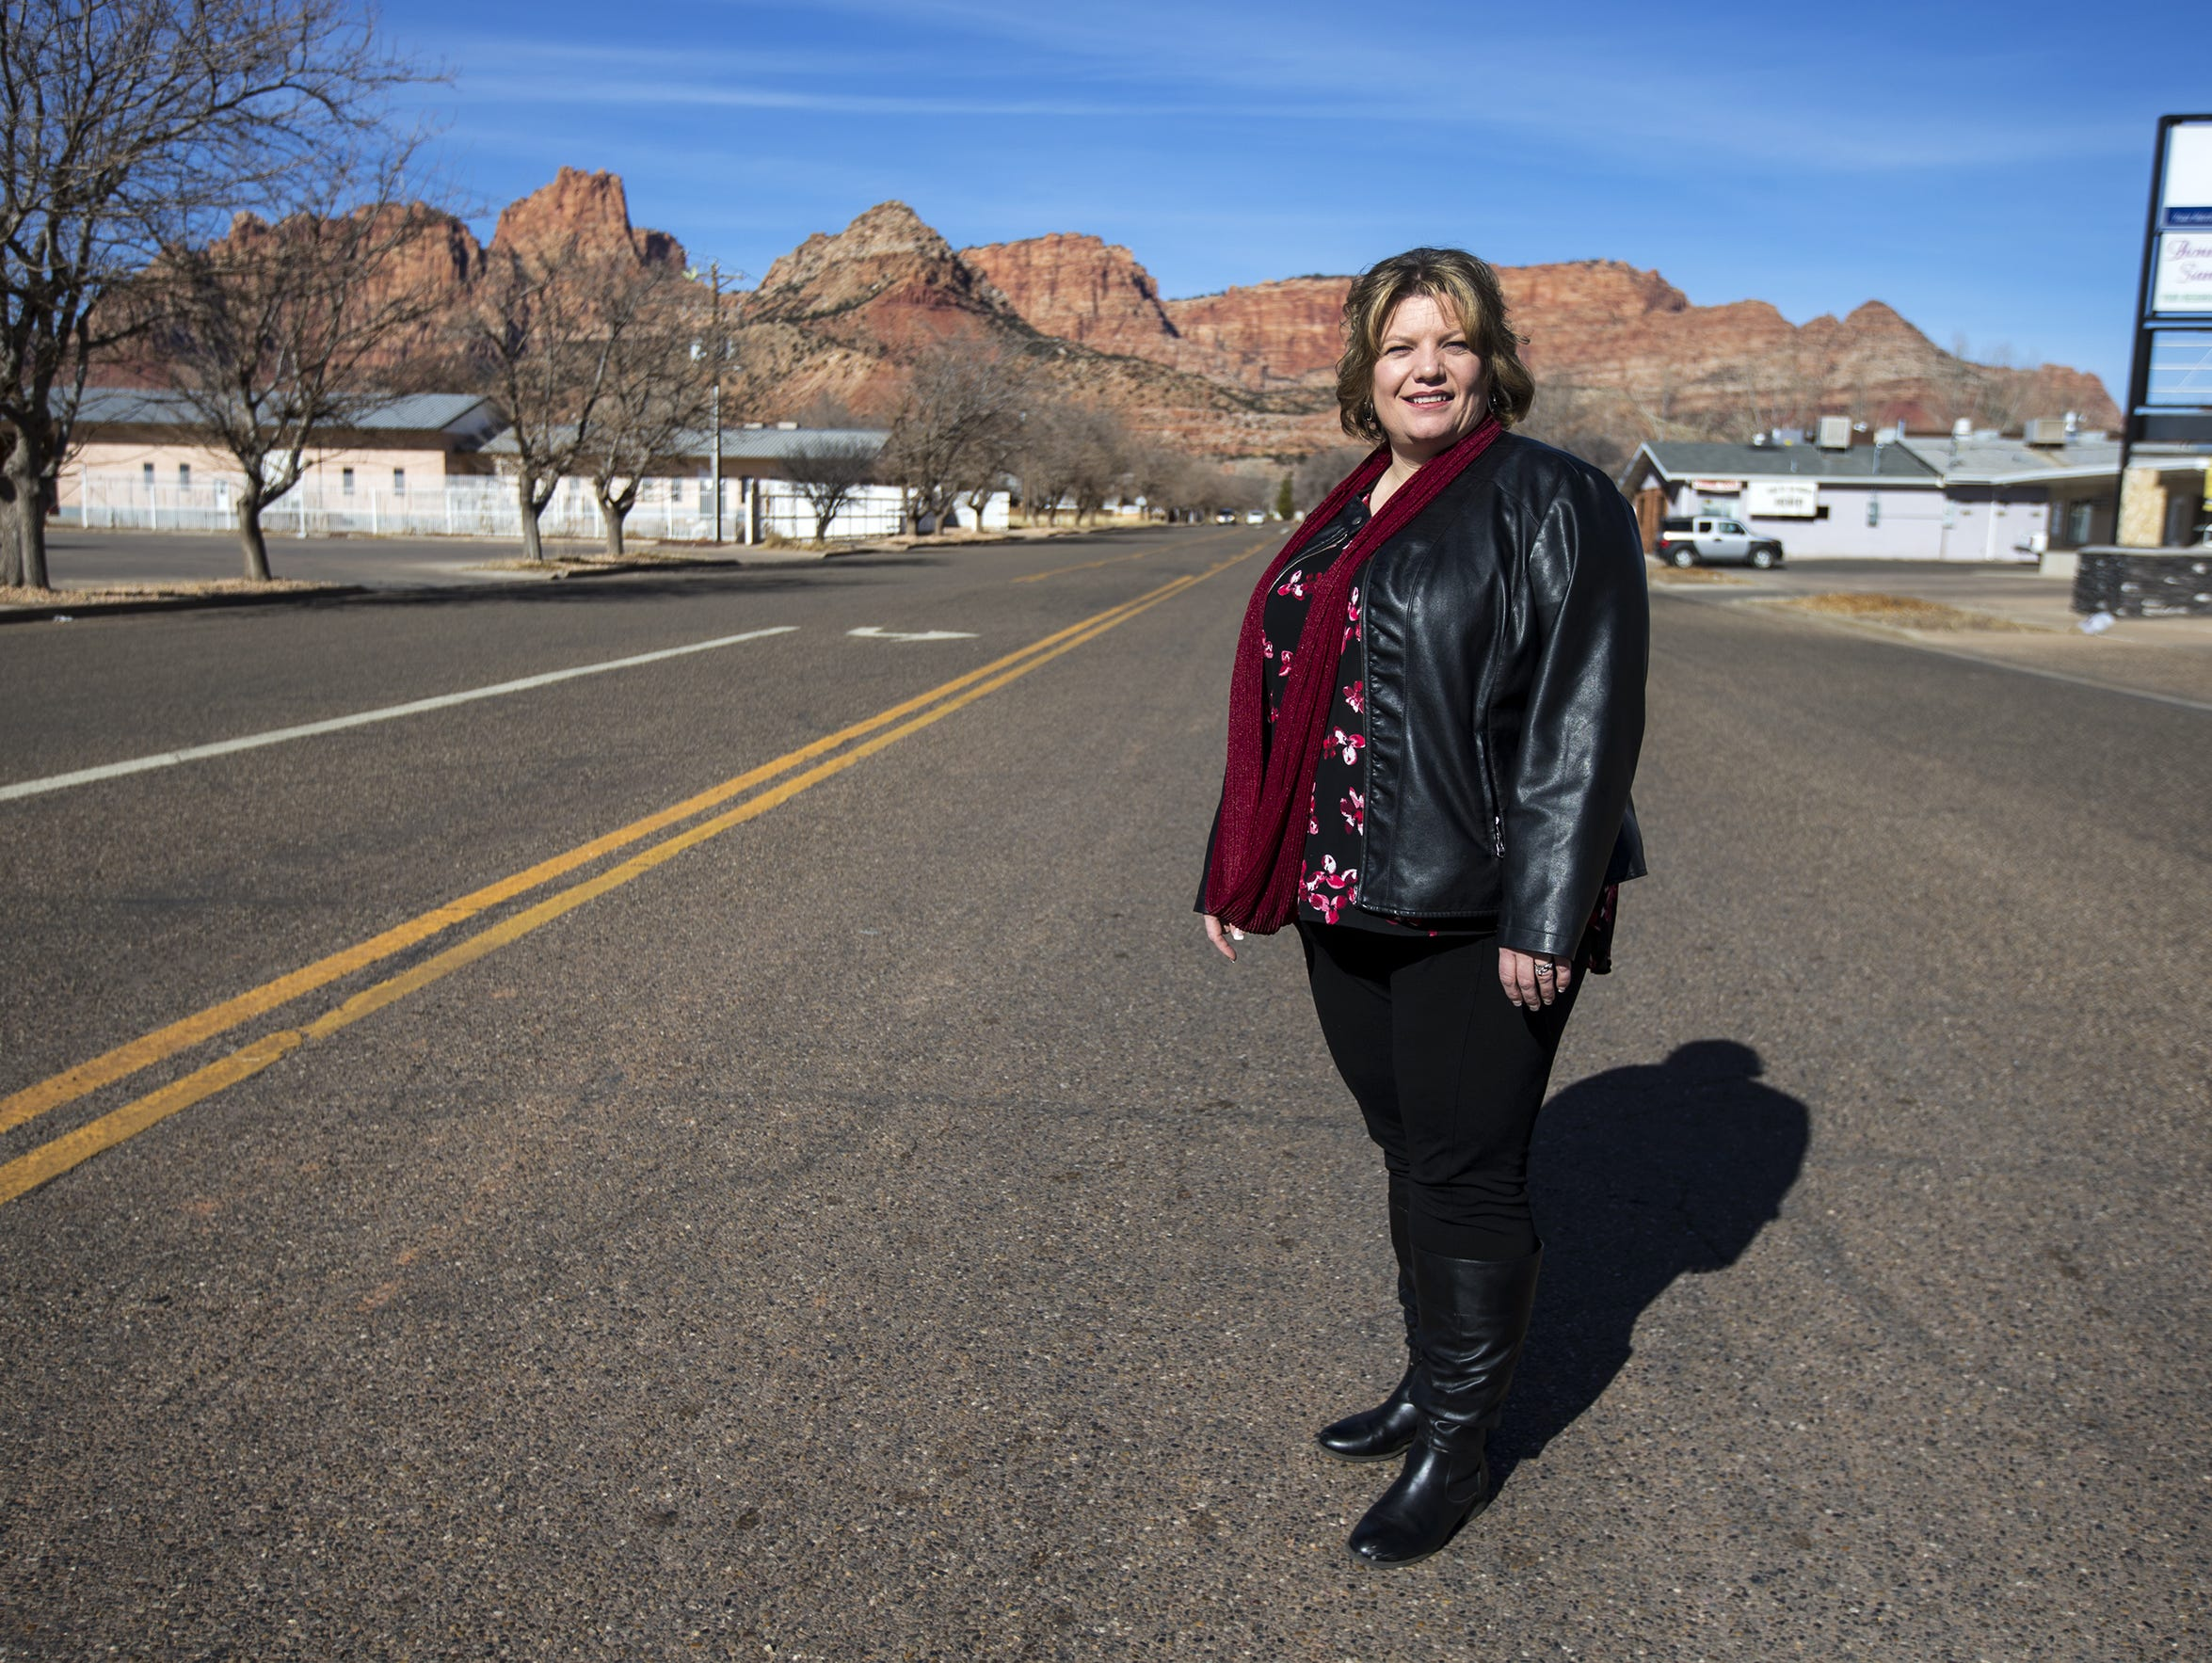 Donia Jessop, the current mayor of Hildale, Utah, is